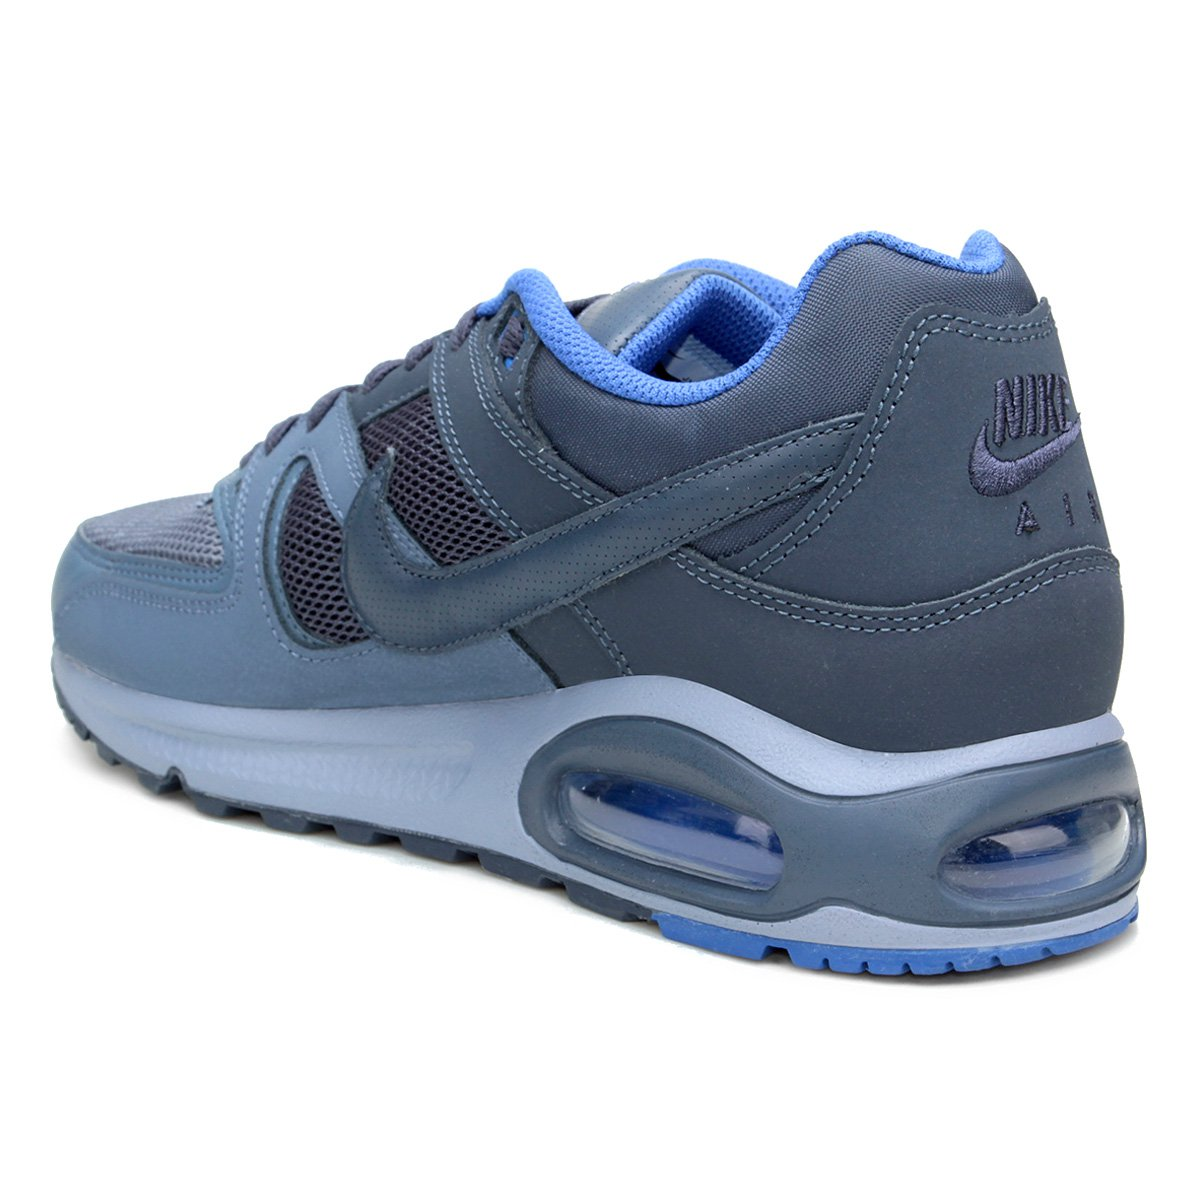 ed1be89f3c Tênis Nike Air Max Command Masculino - Azul - Compre Agora